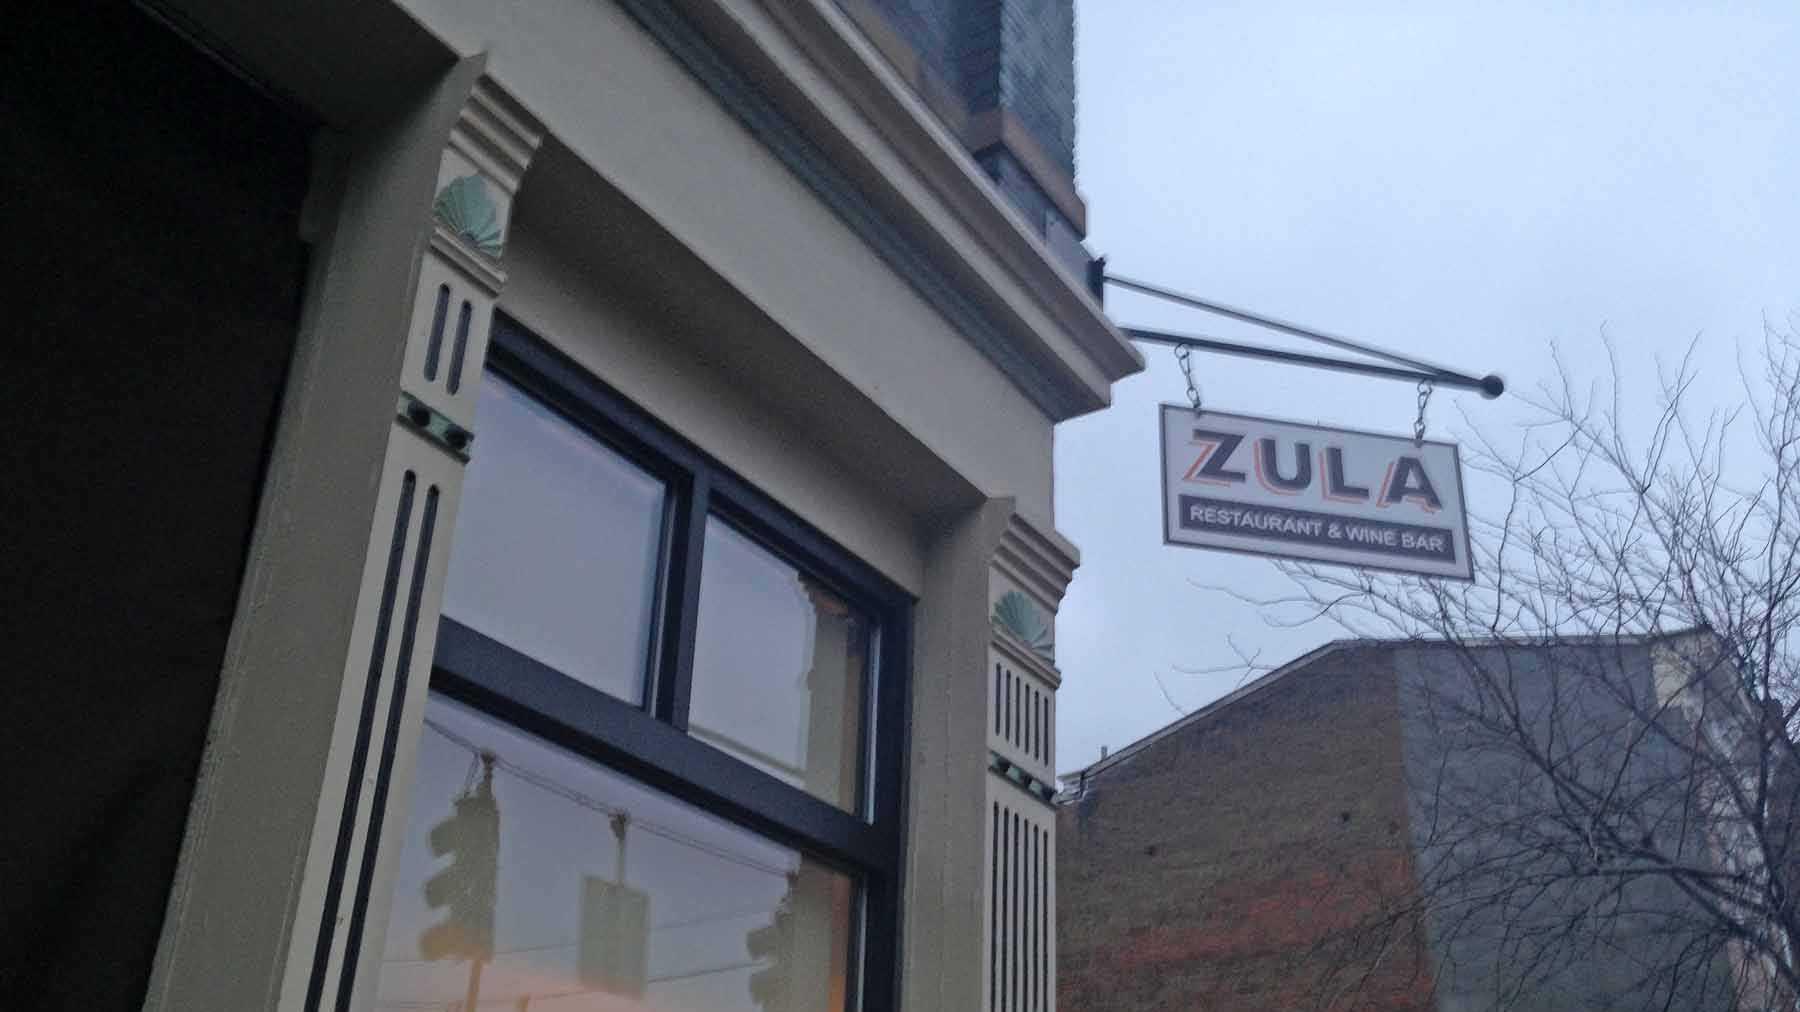 Zula fire 3-12-143.jpg